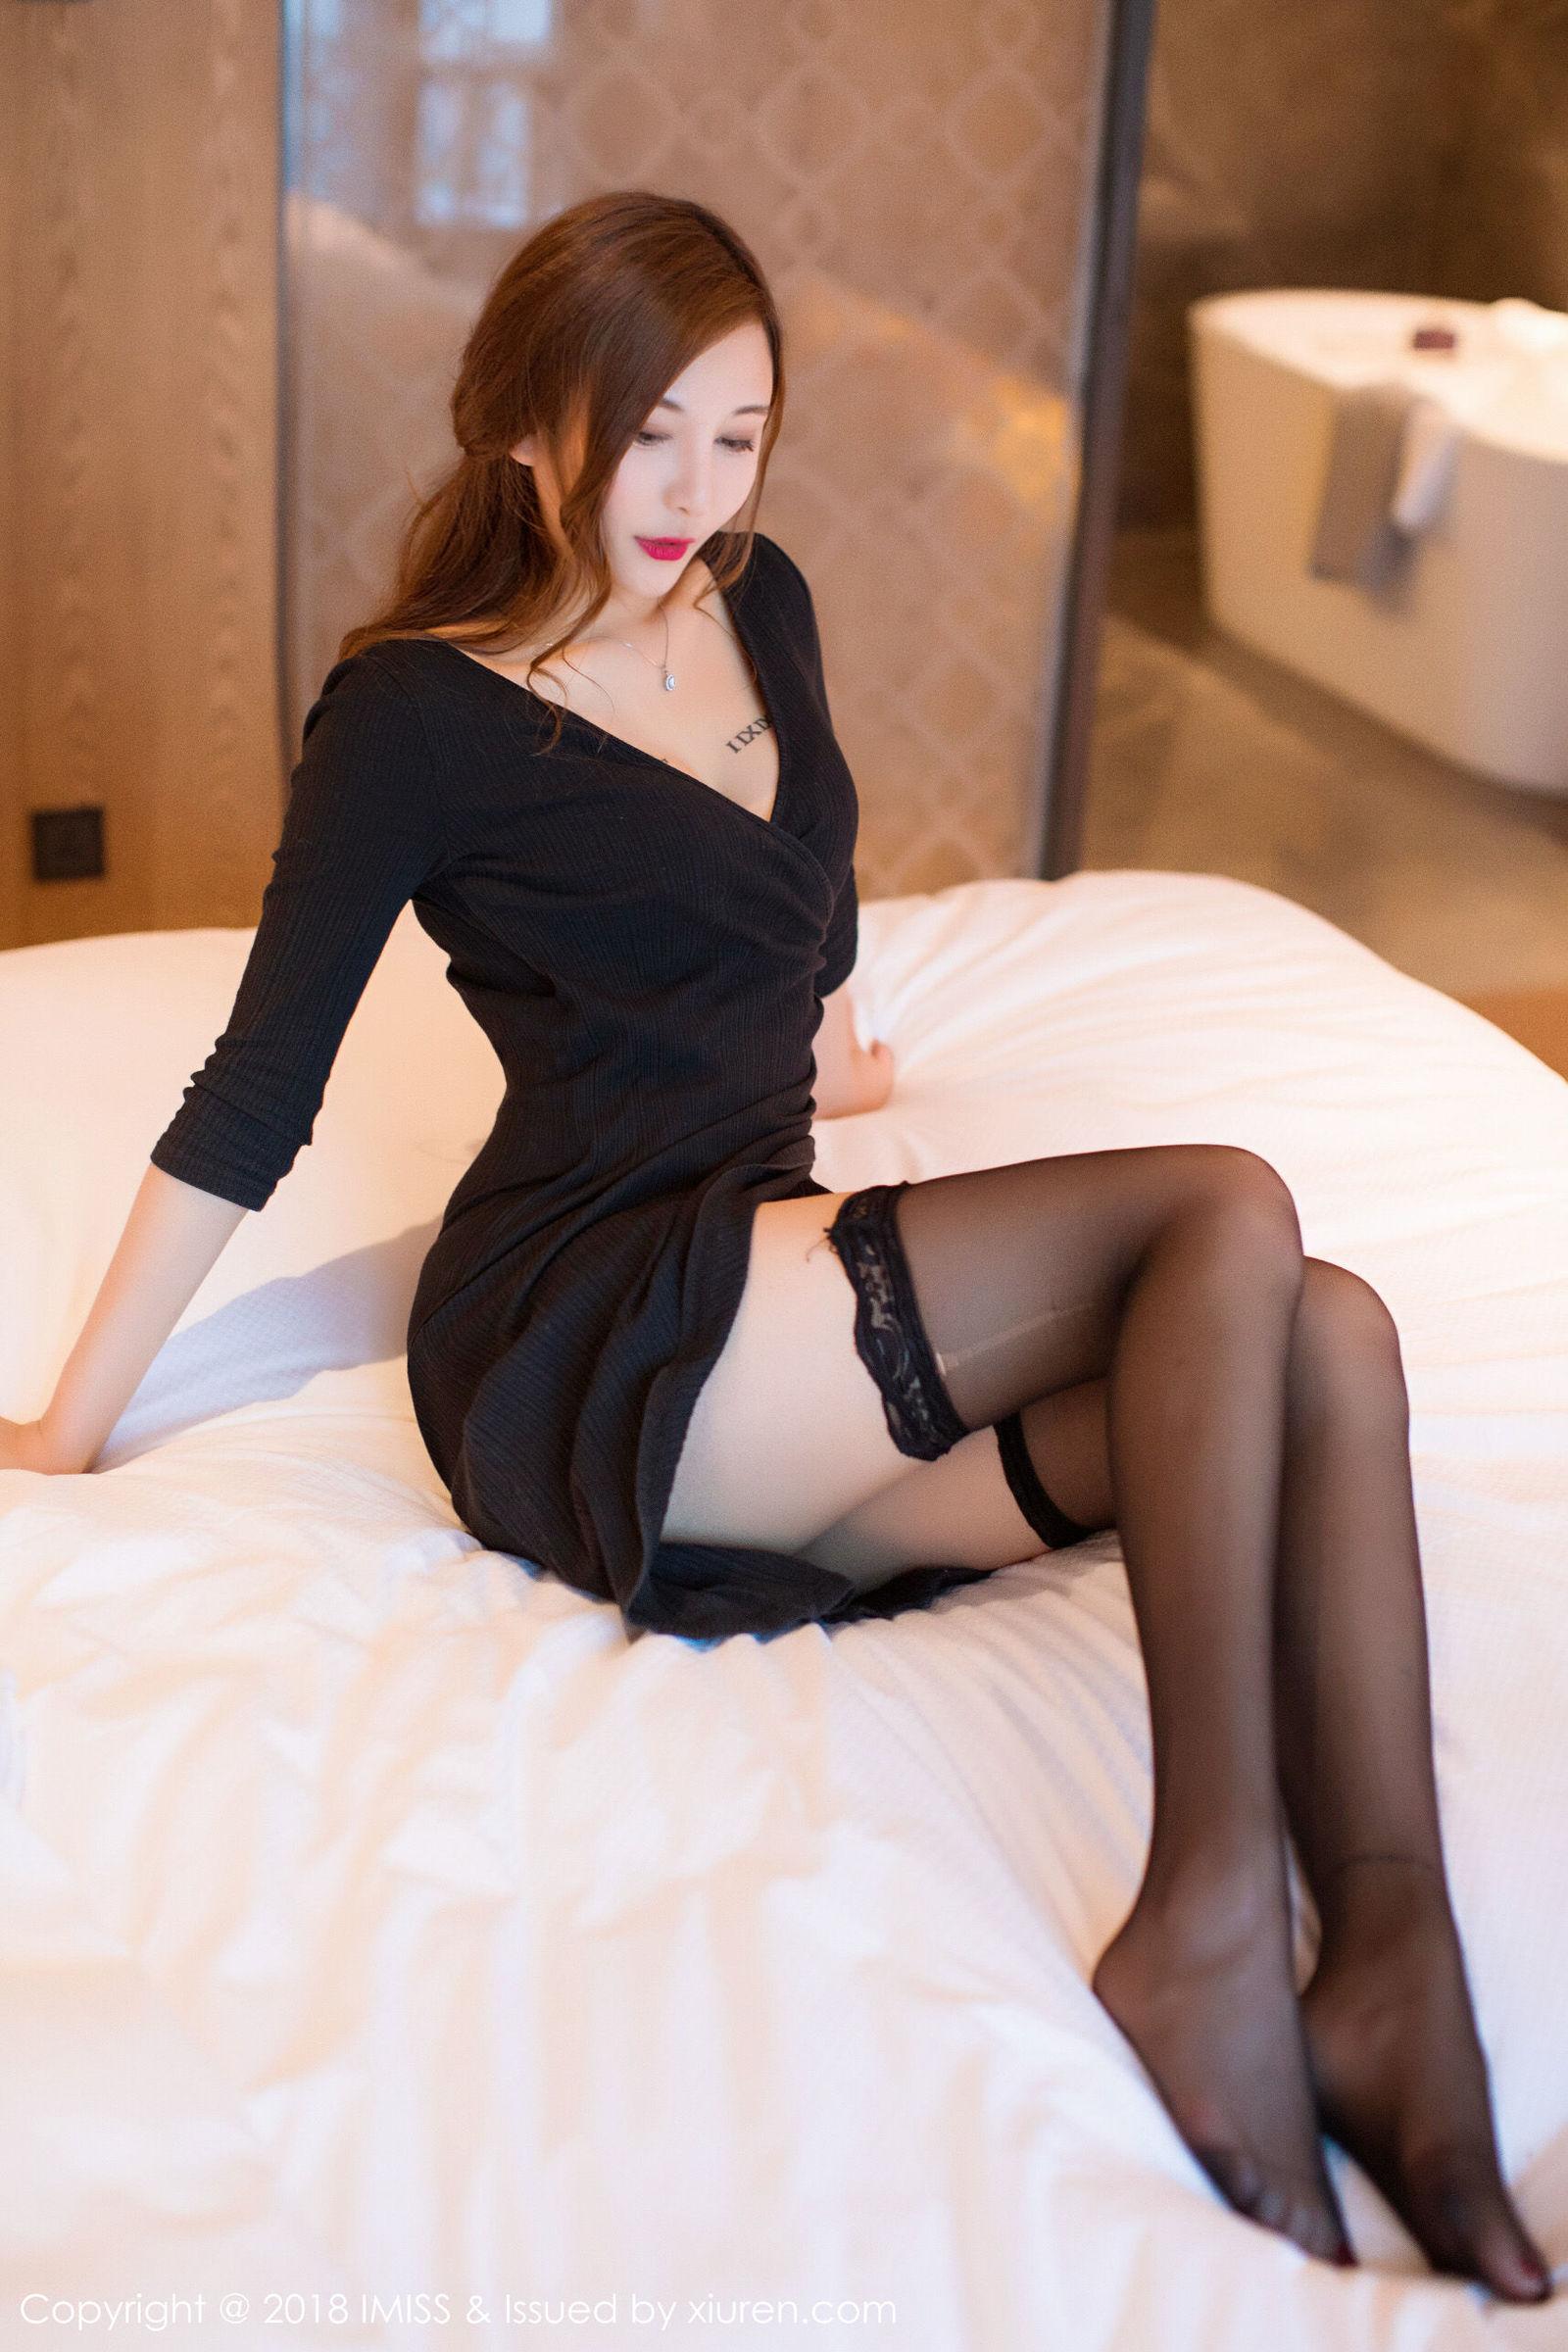 ATFB-406长发略带清纯美女高清写真